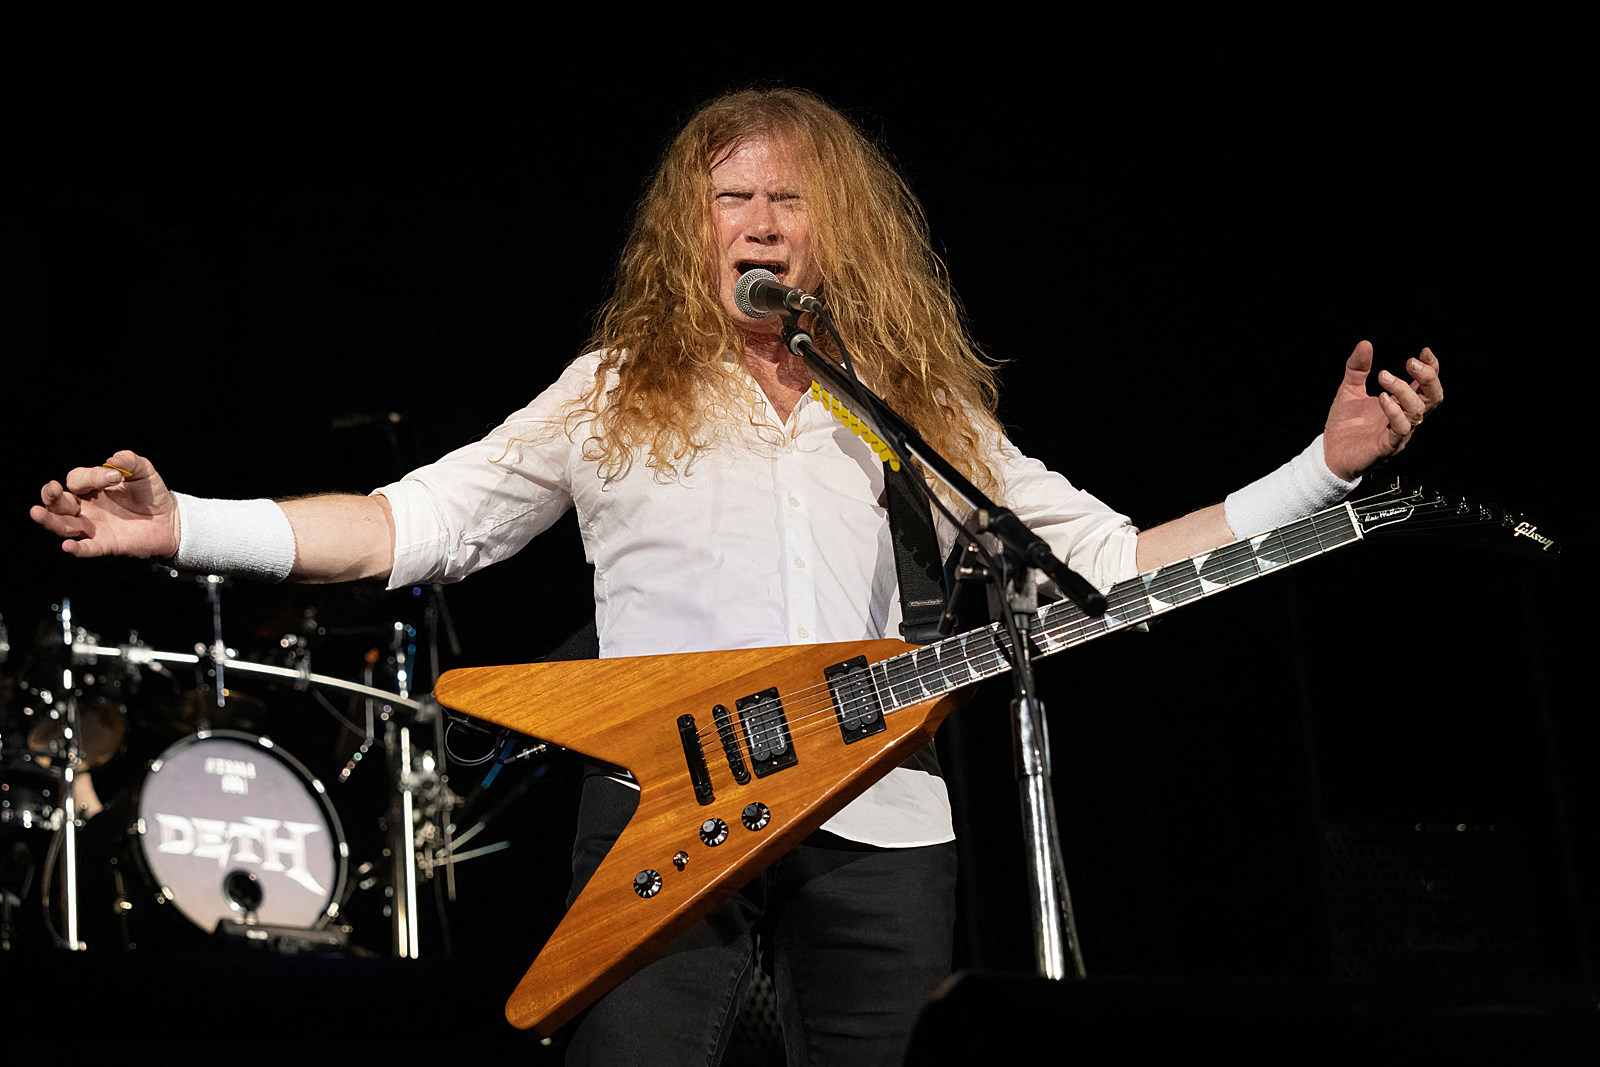 Megadeth's Dave Mustaine Slams 'Tyranny' of Mask Mandates